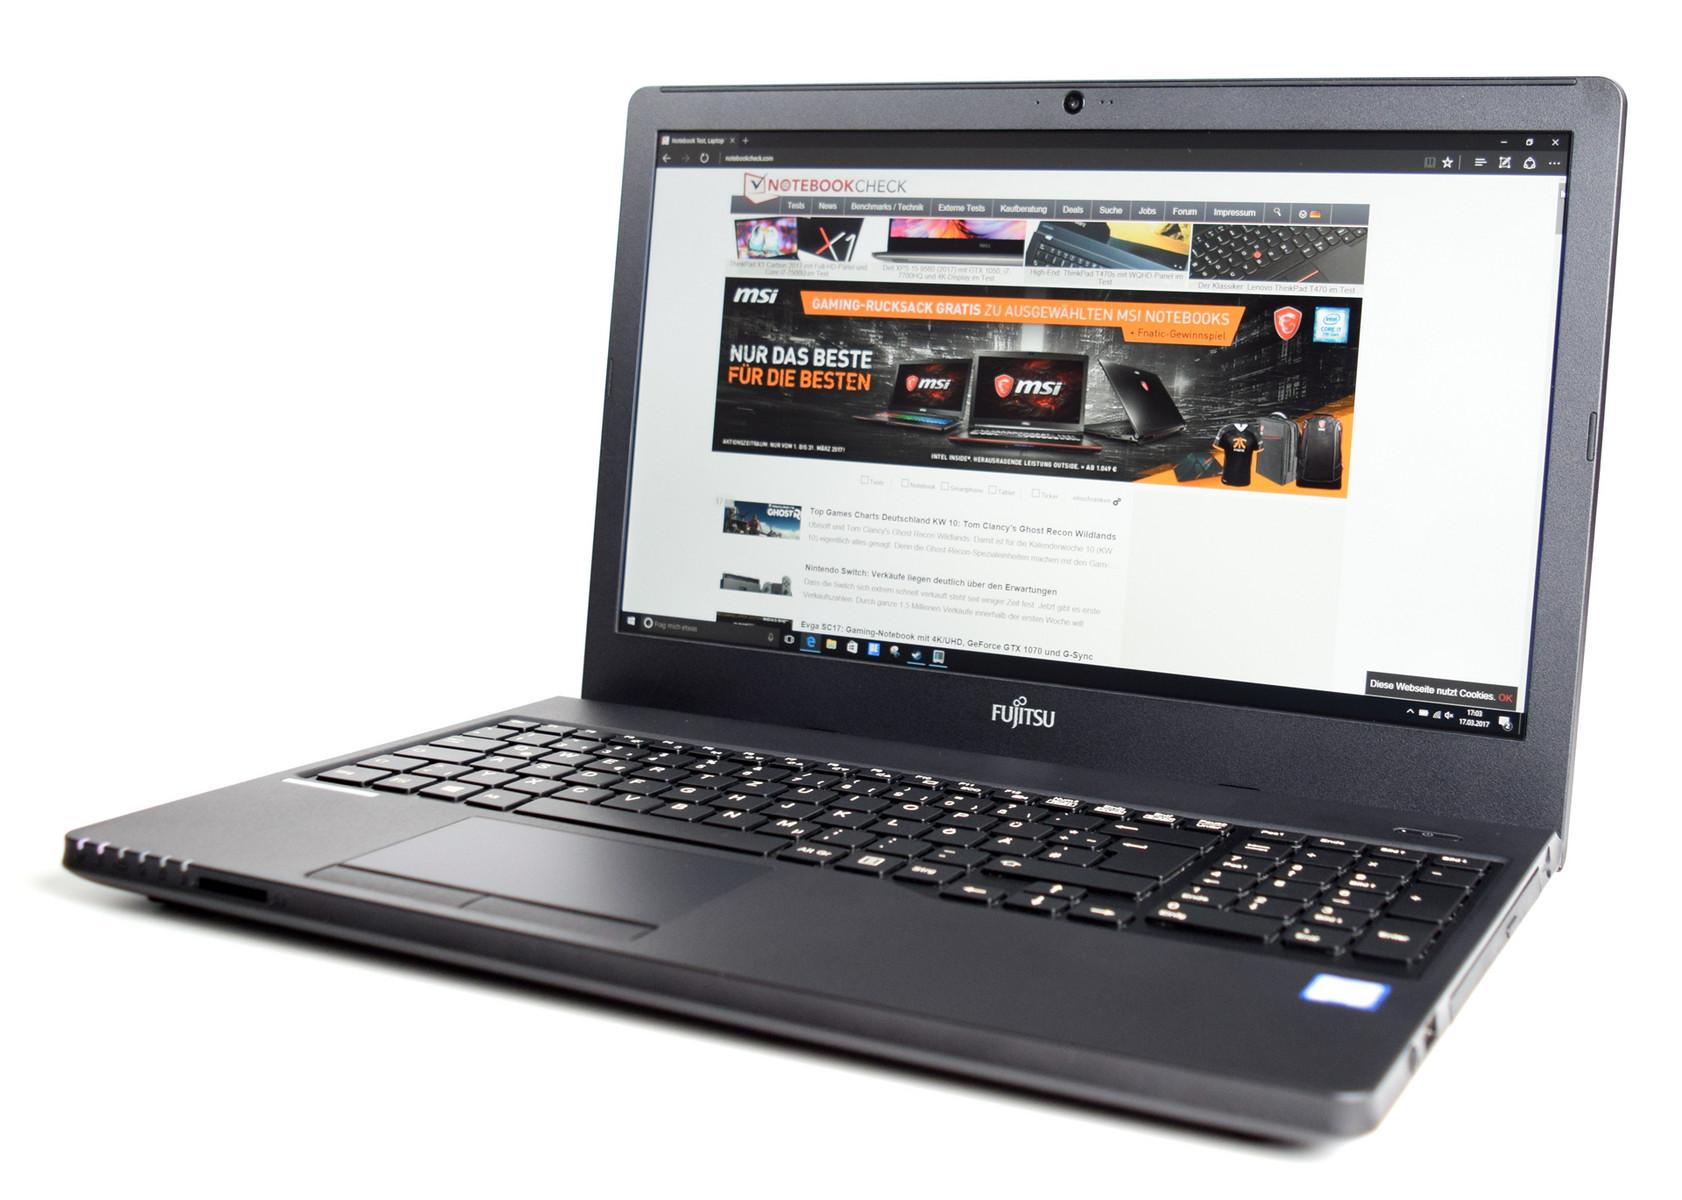 Fujitsu Lifebook A557 External Reviews